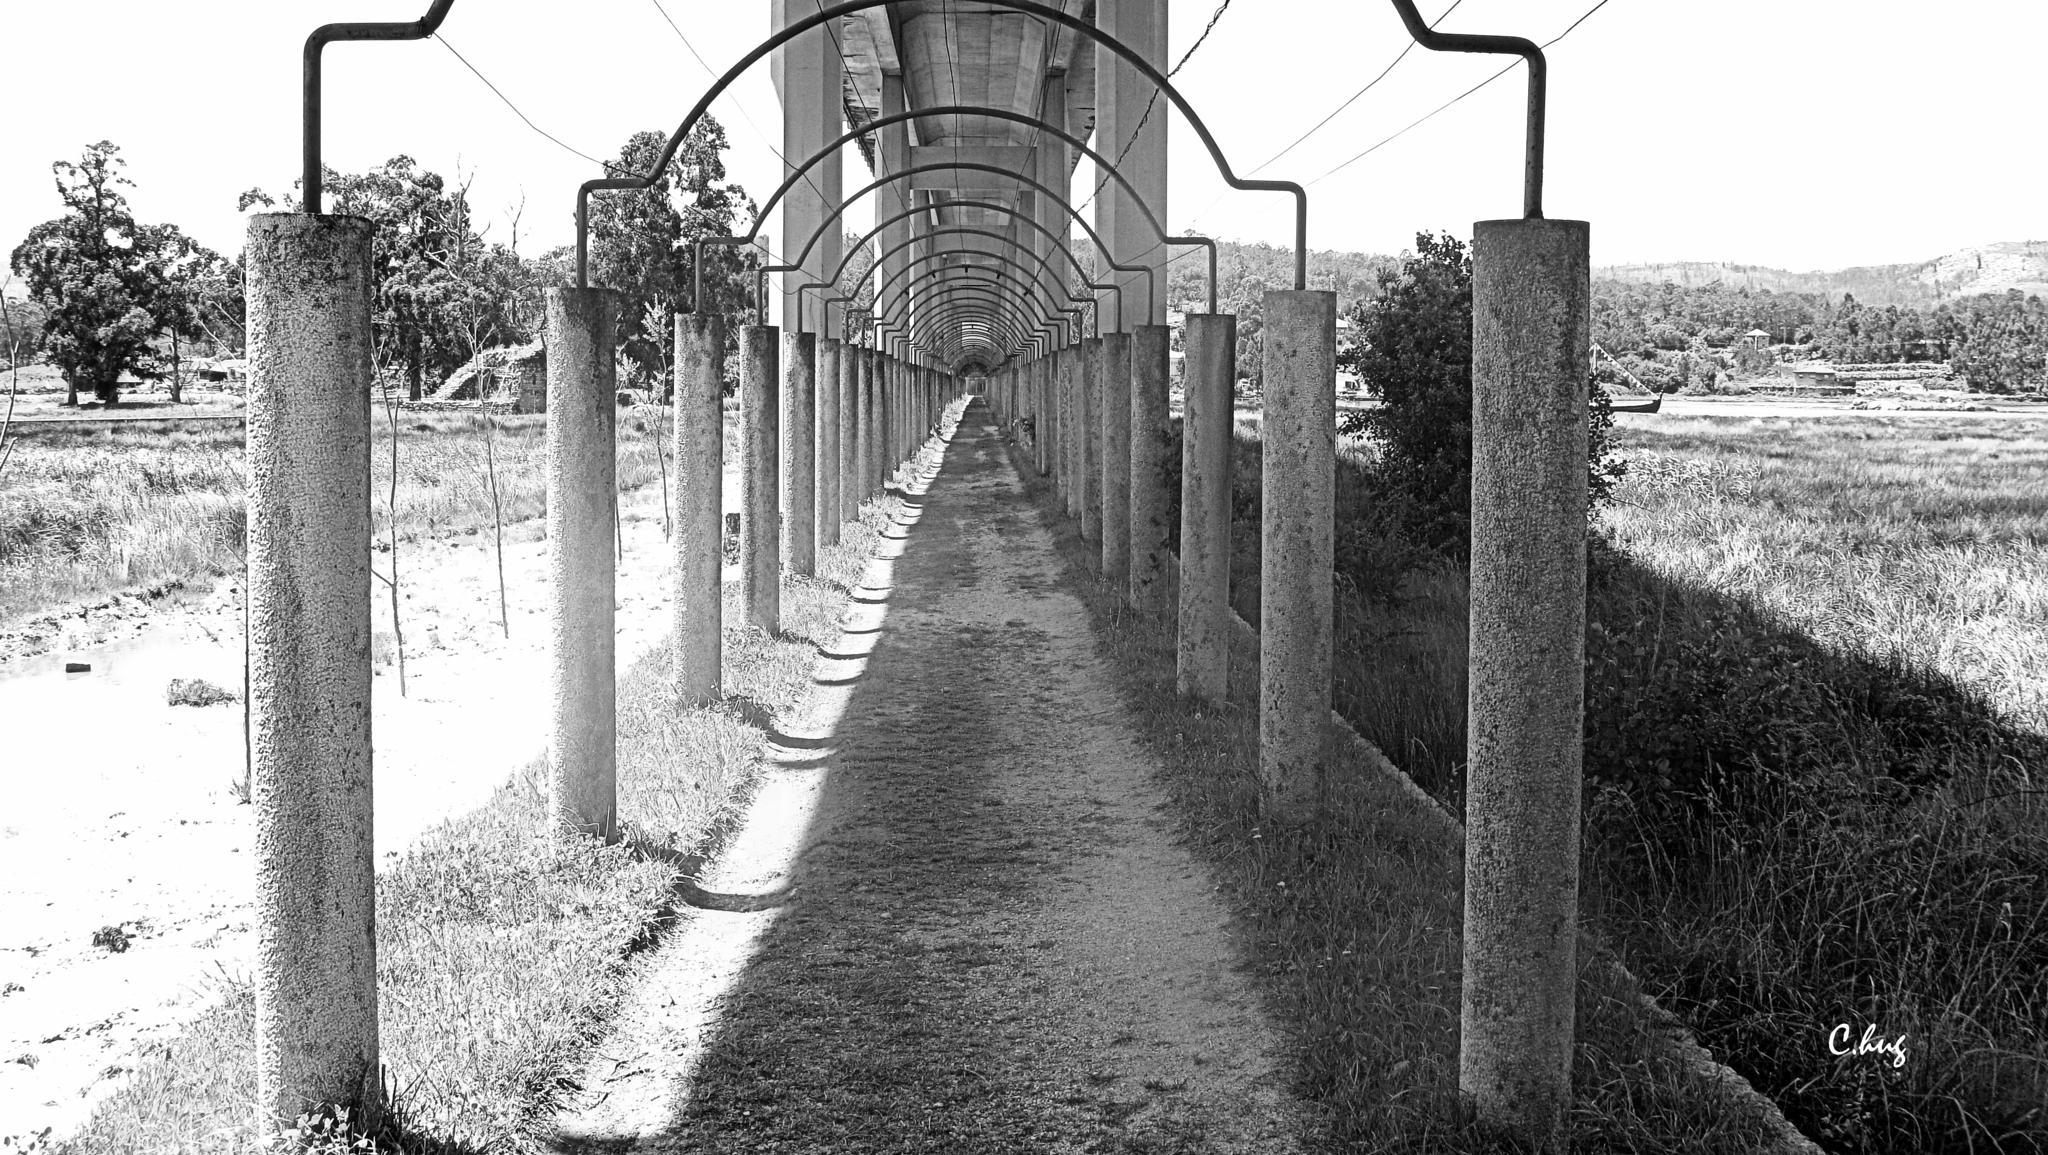 Chemin ombragé by Huguenin Claude